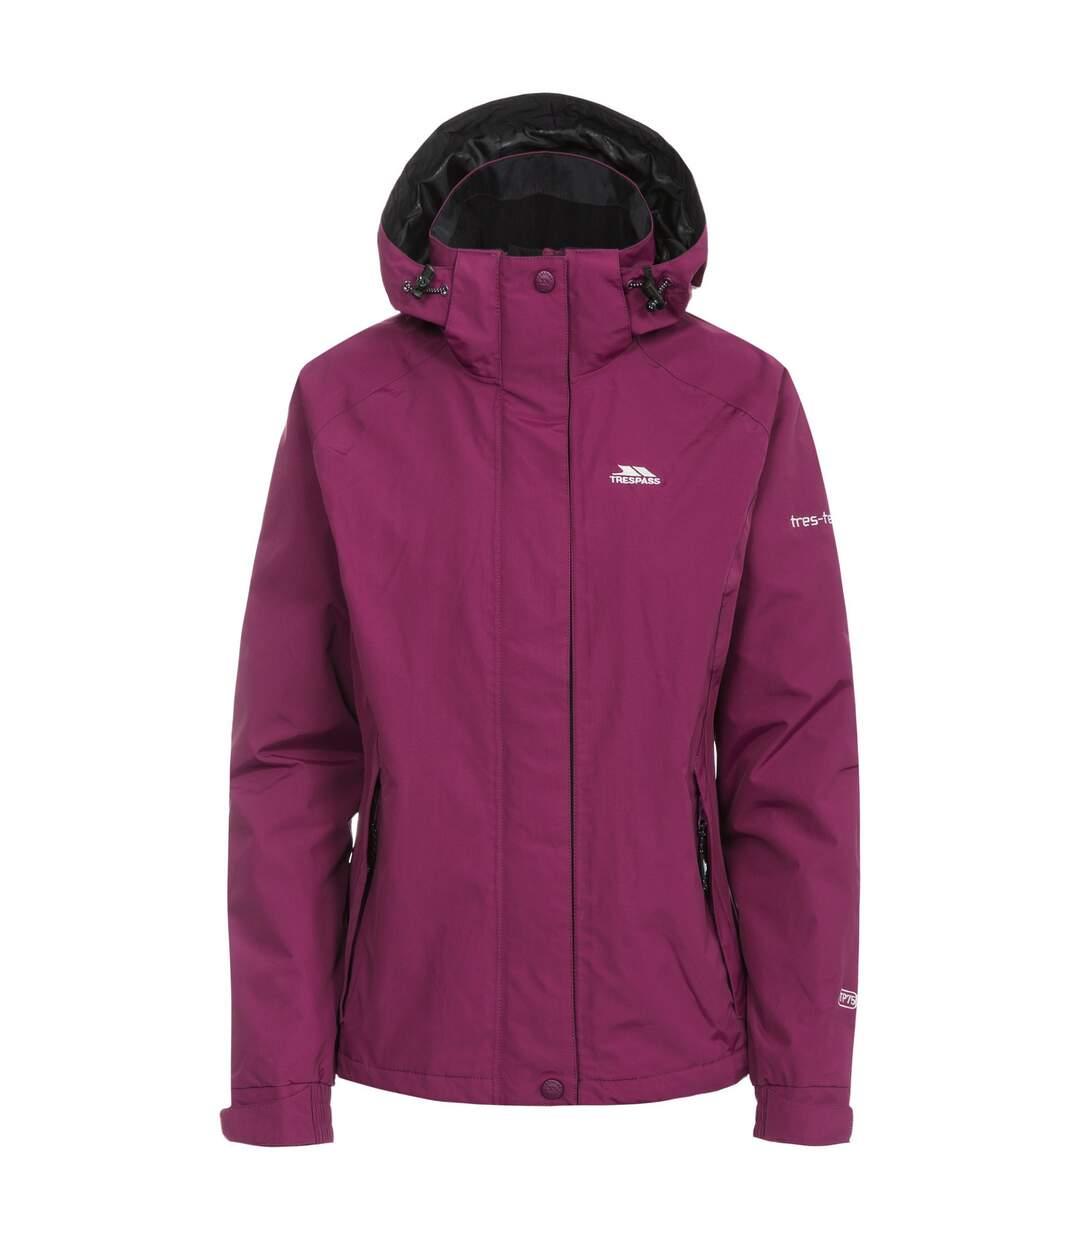 Trespass Womens/Ladies Florissant Hooded Waterproof Jacket (Grape Wine) - UTTP170